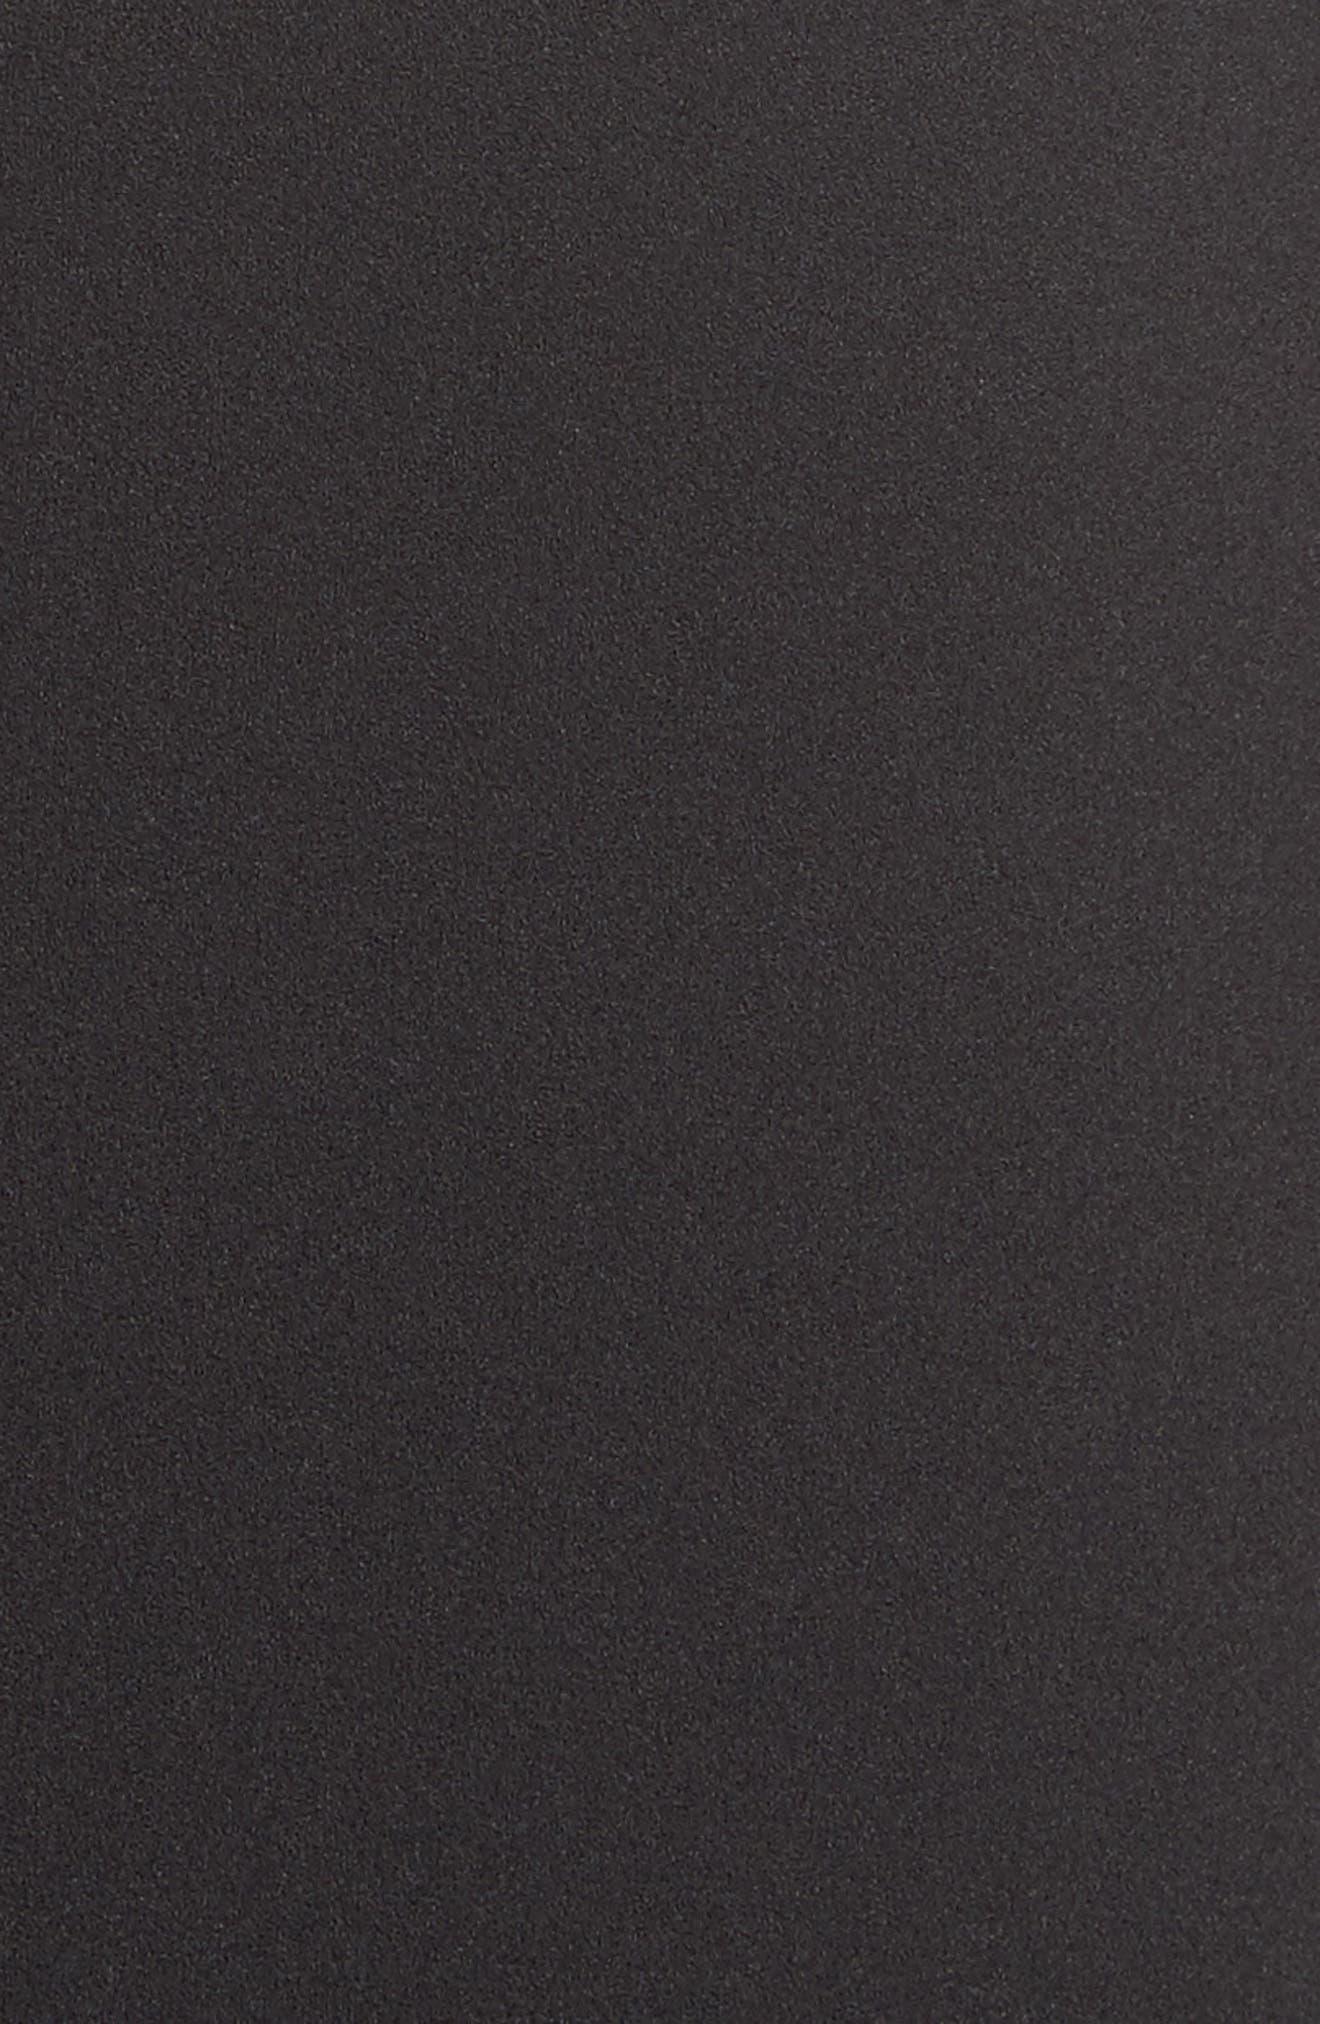 Crepe Ruched Sleeve Shift Dress,                             Alternate thumbnail 5, color,                             Black